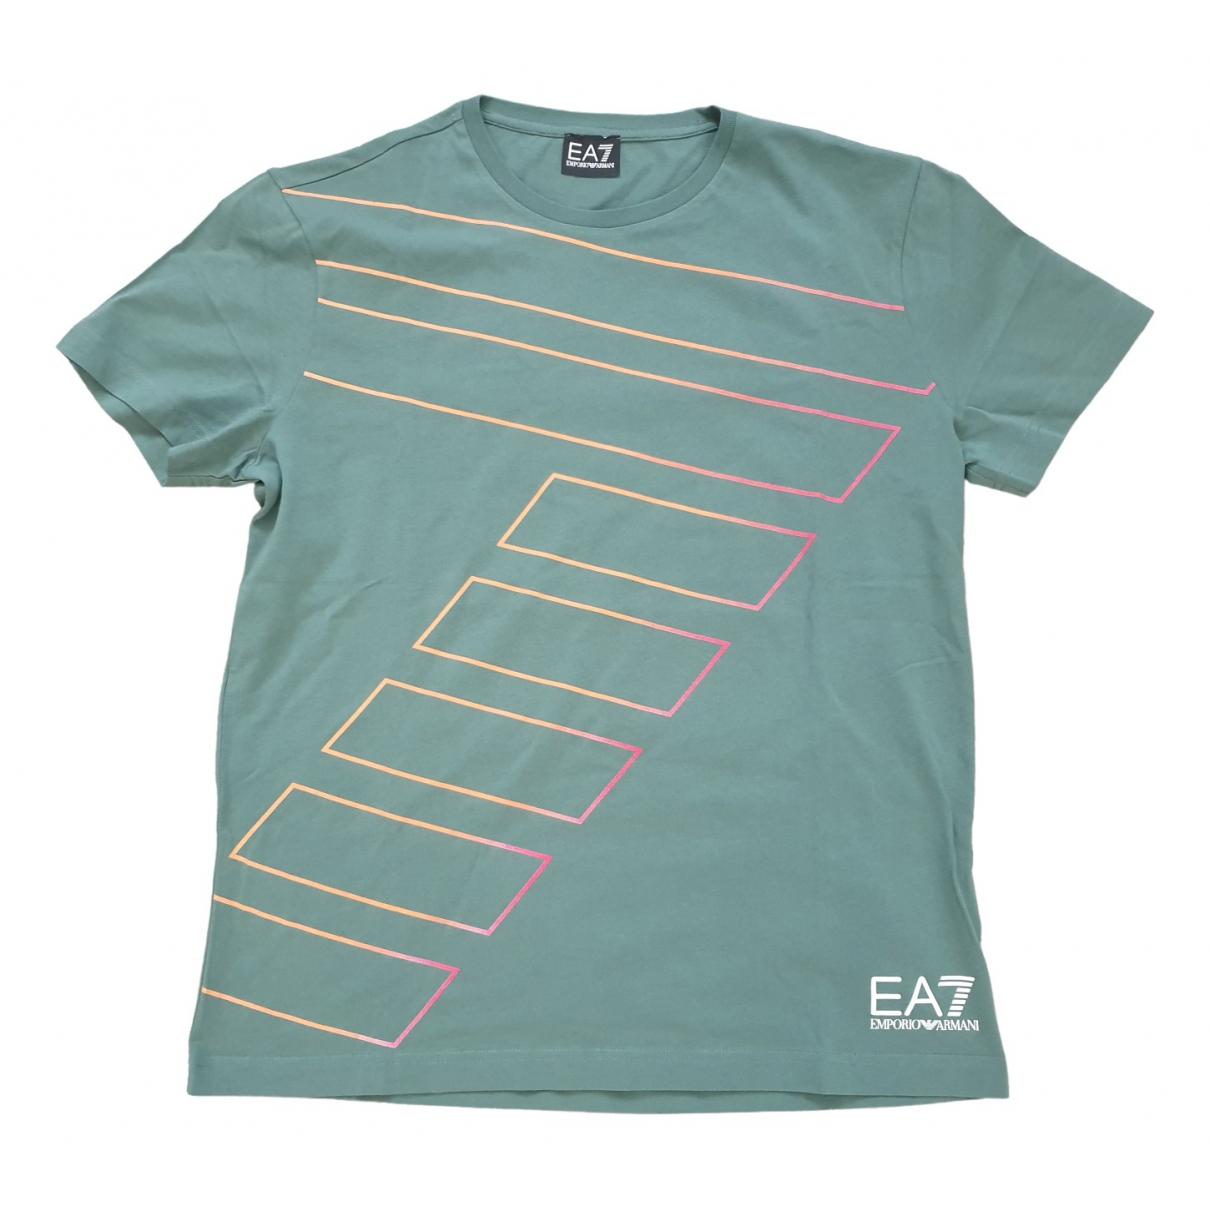 Emporio Armani \N Green Cotton T-shirts for Men L International